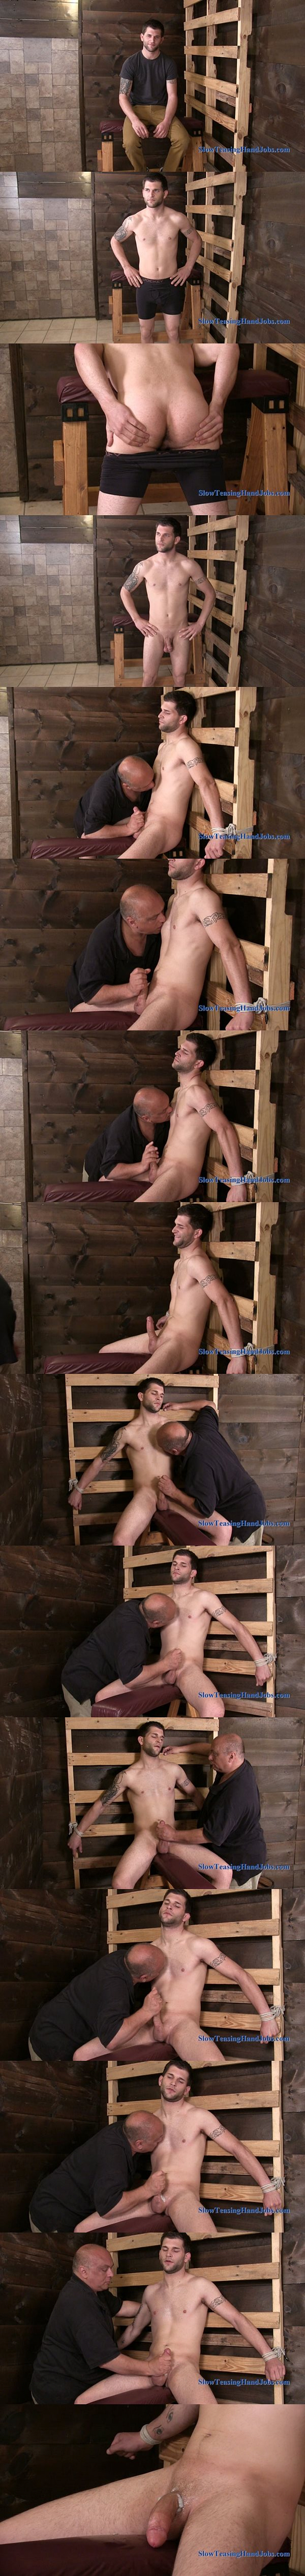 Hot Italian straight guy Mac gets nipples sucked and dick jerked at Slowteasinghandjobs 02